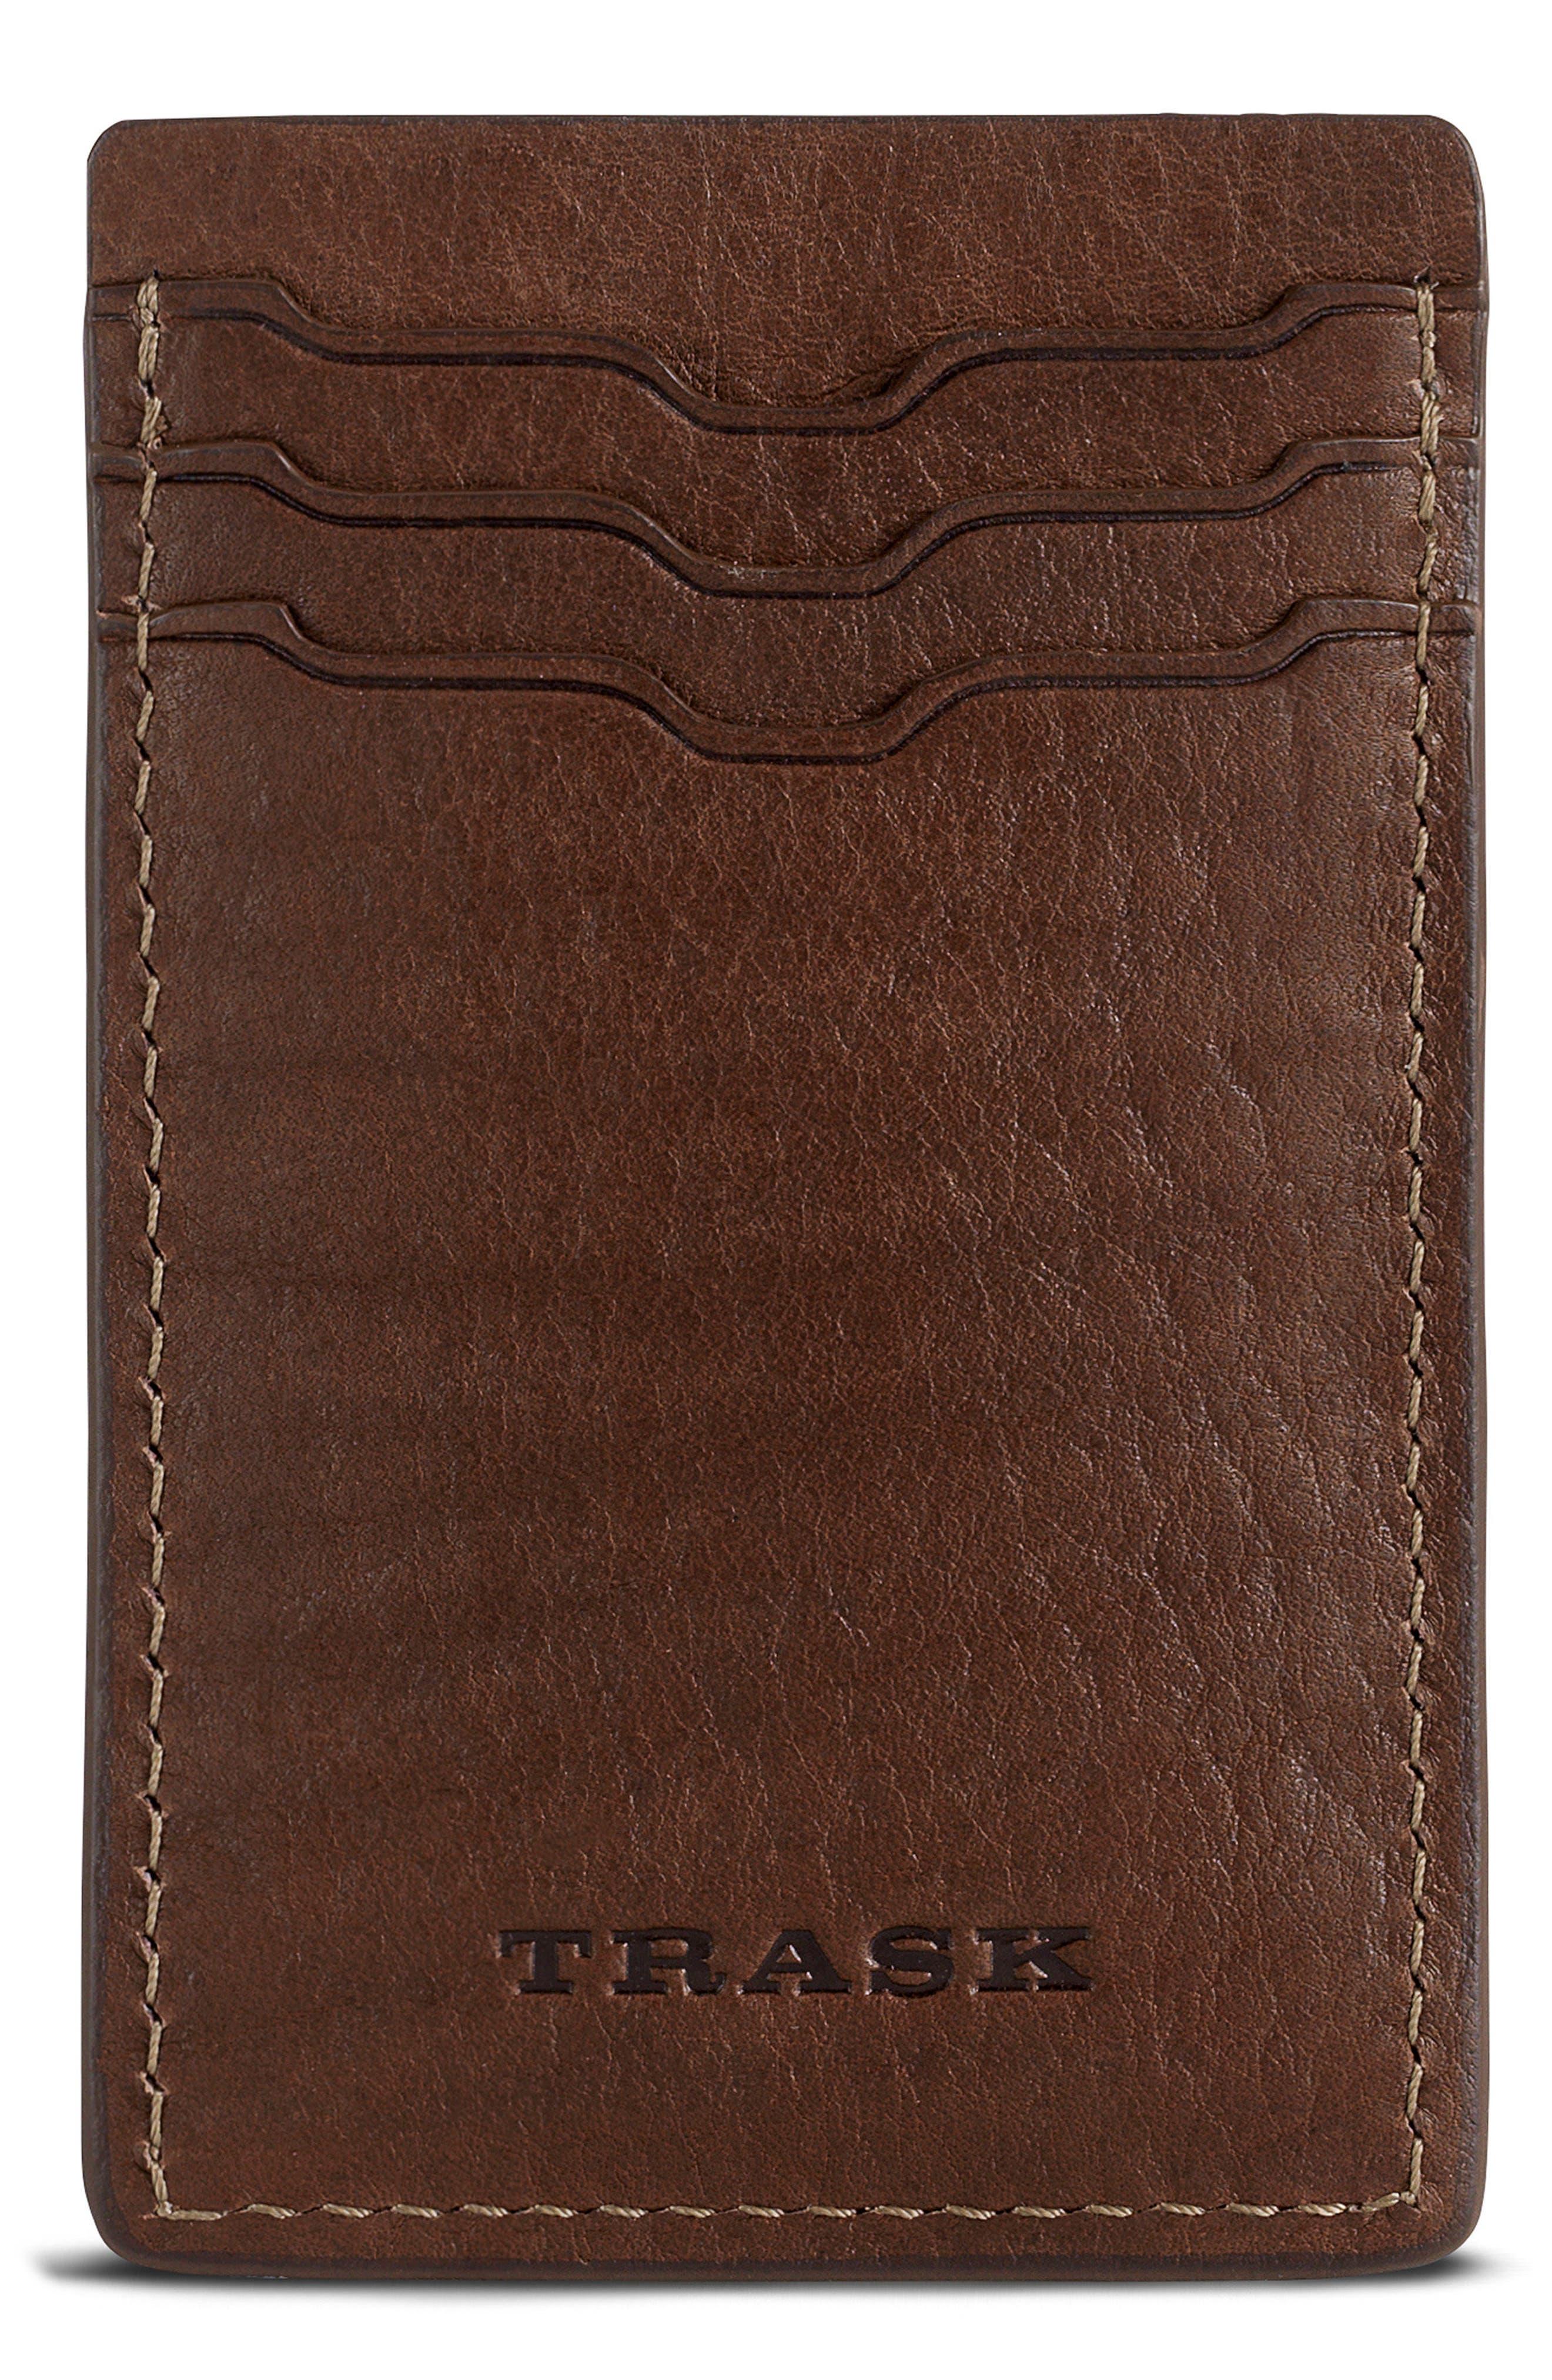 Jackson Money Clip Card Case,                             Main thumbnail 1, color,                             200